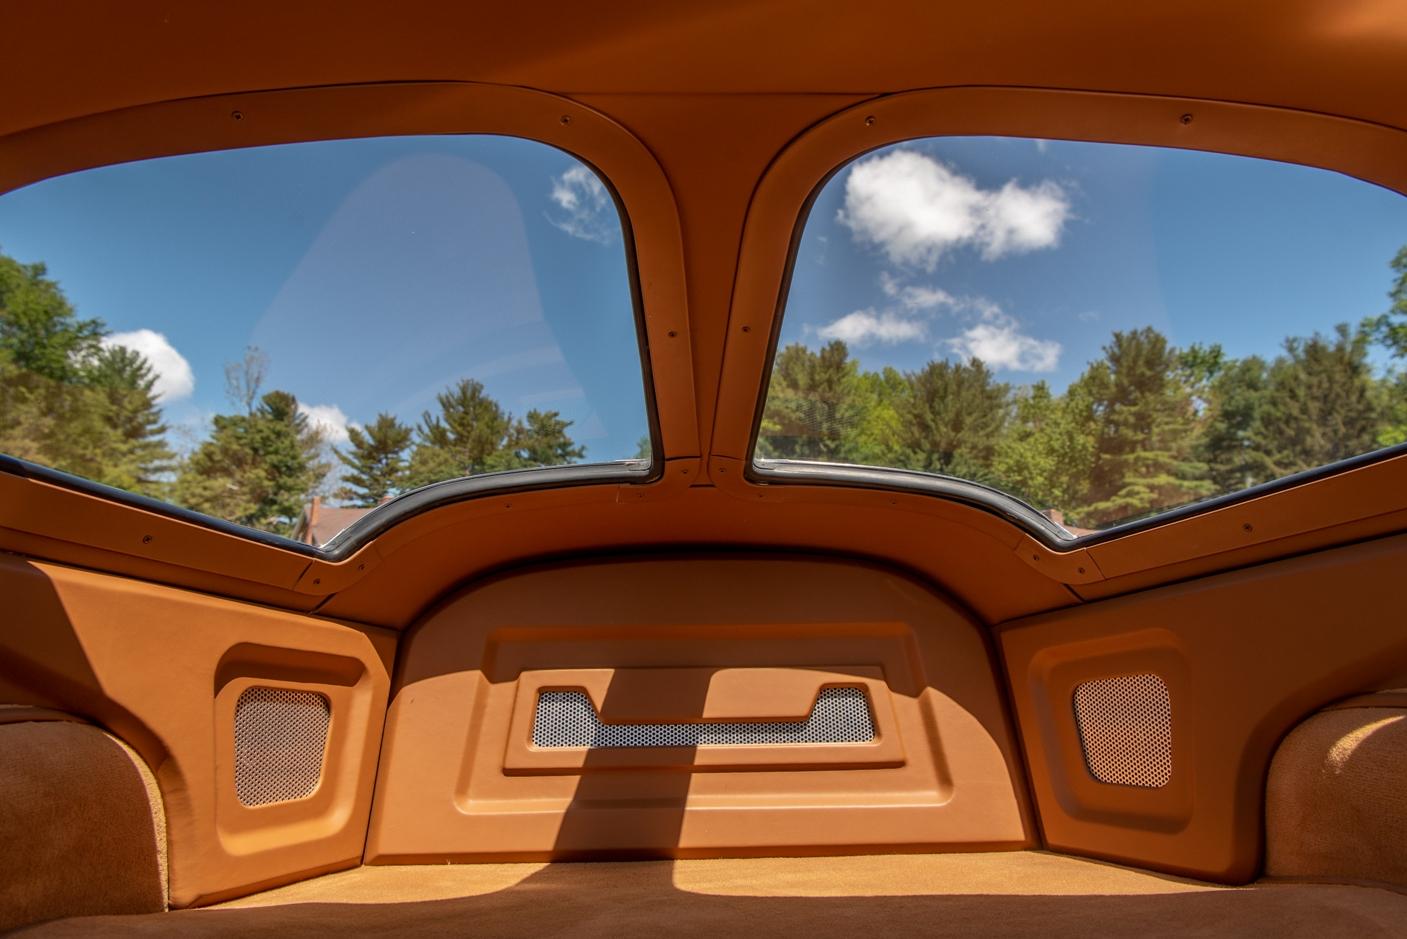 Interior of 1963 Corvette